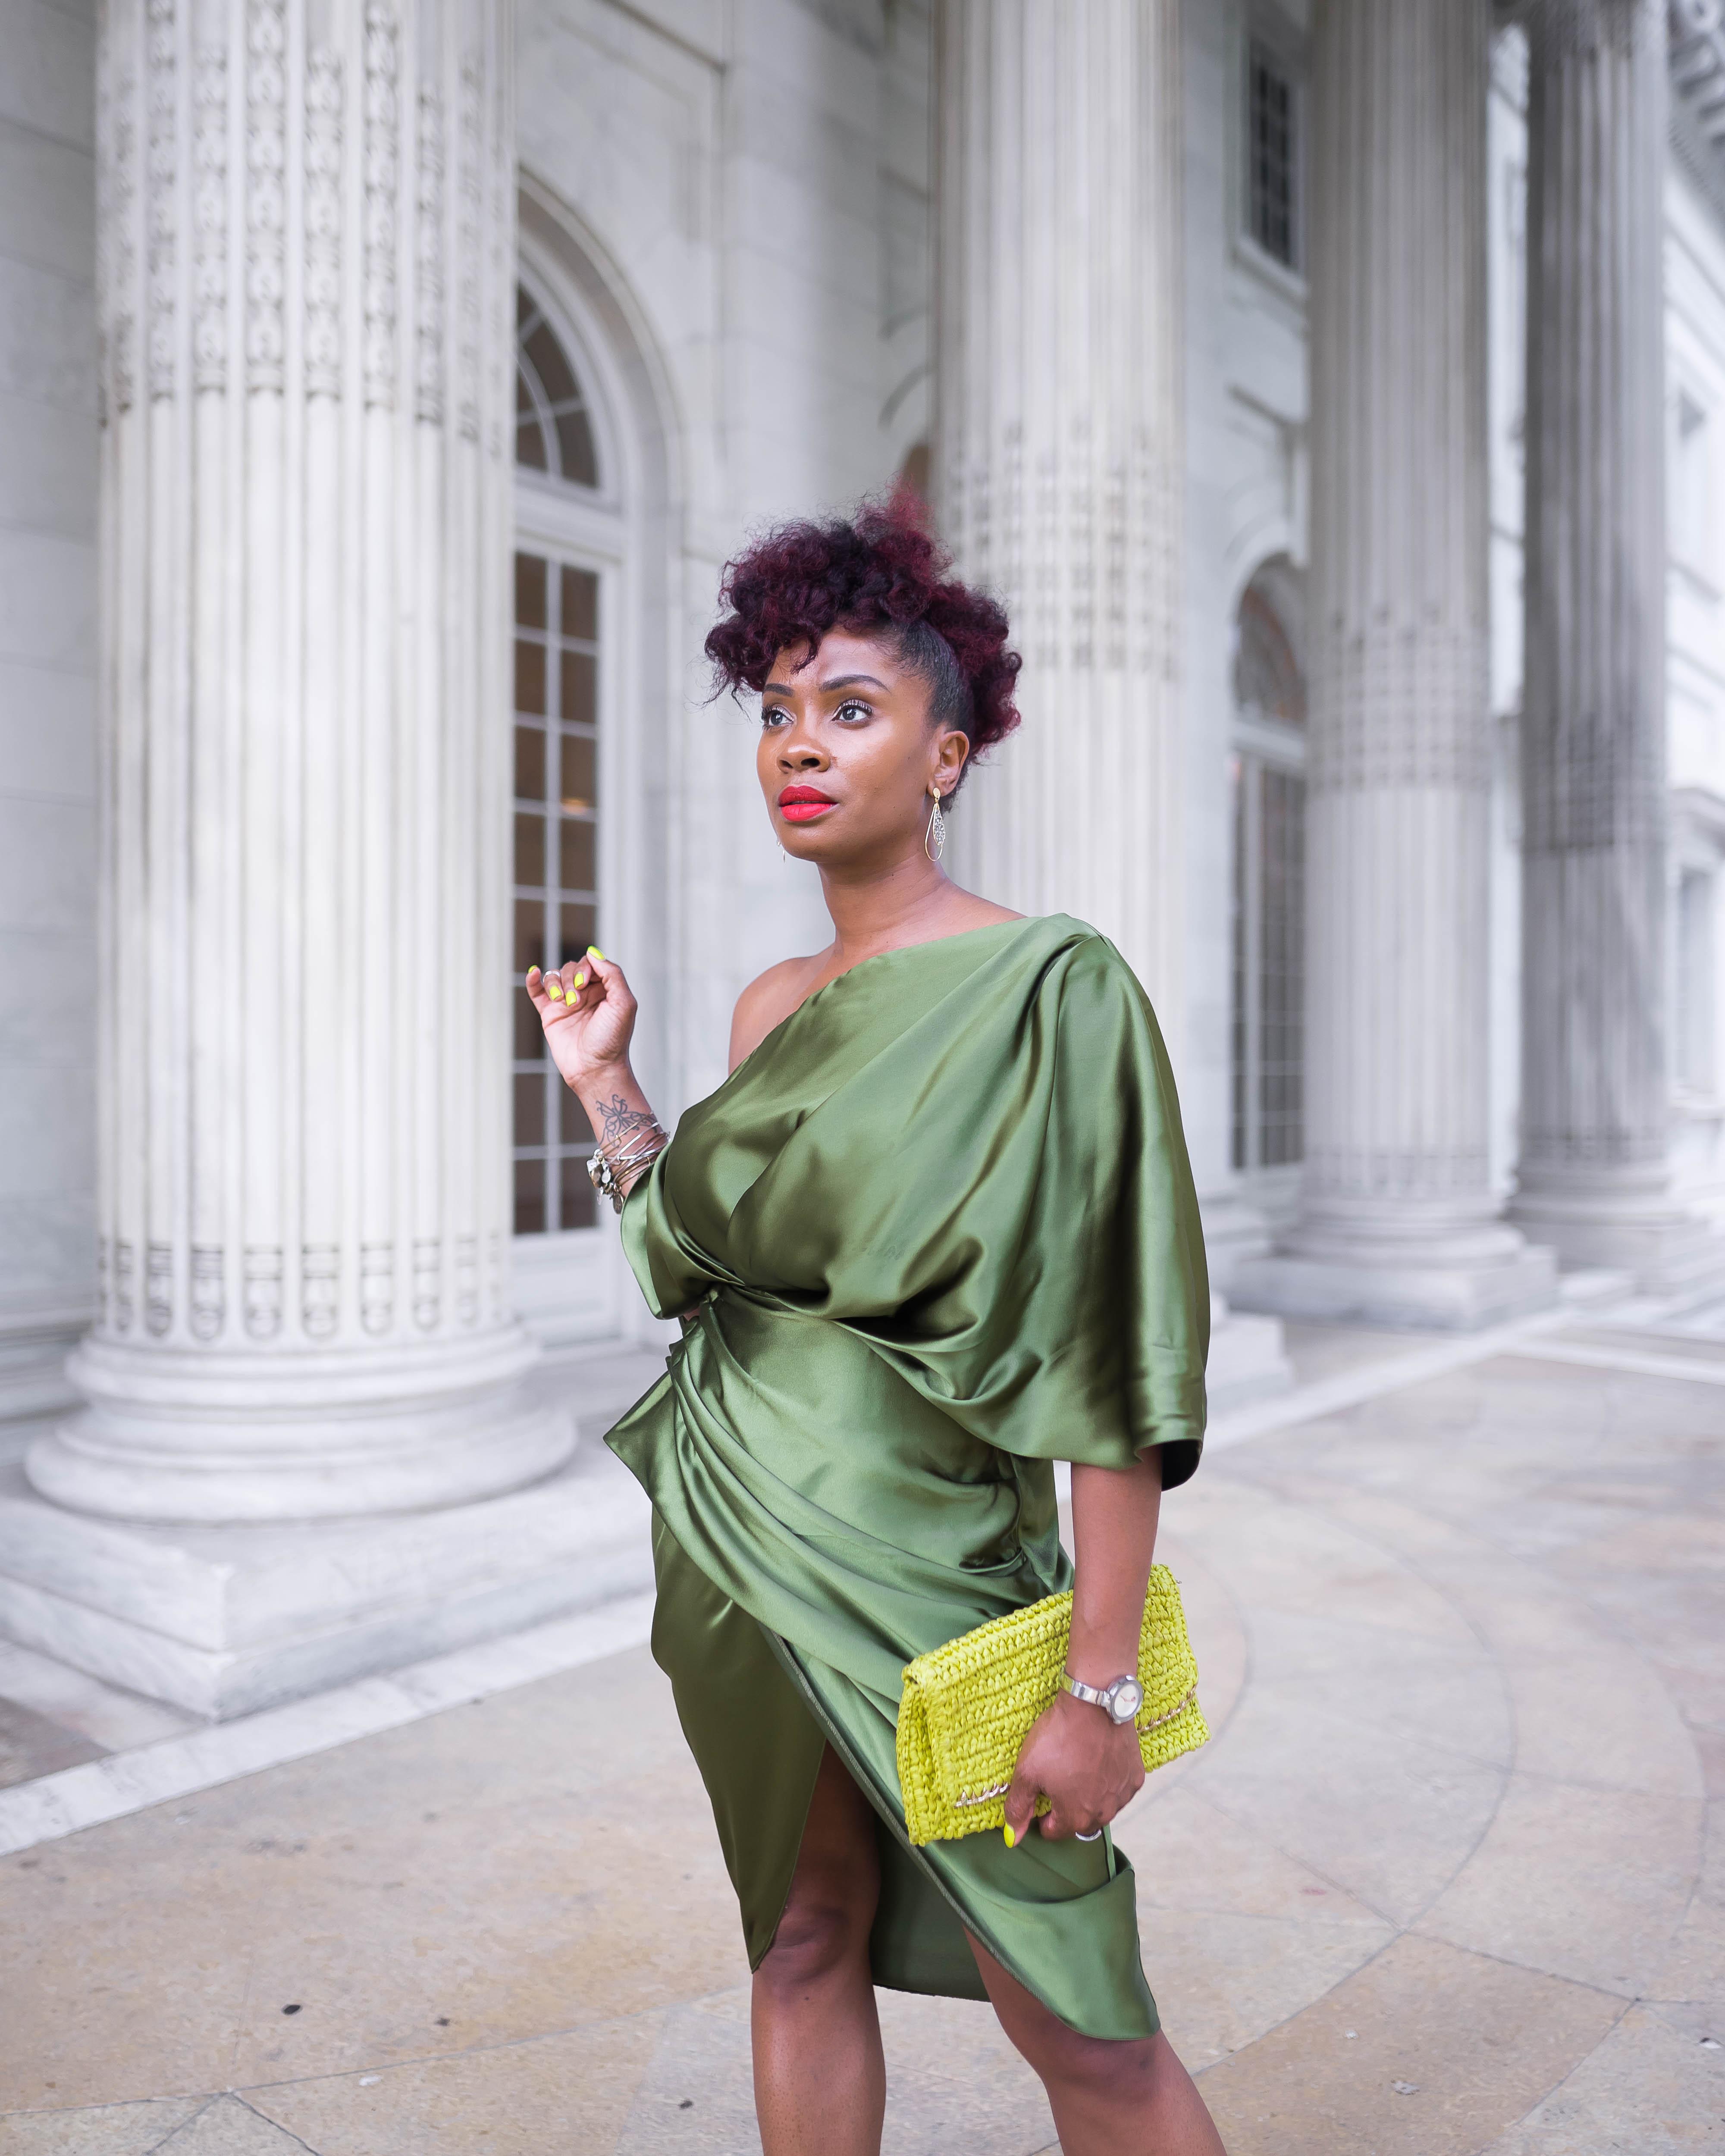 Yana B of Style Stamped fashion, lifestyle, mommy blogger